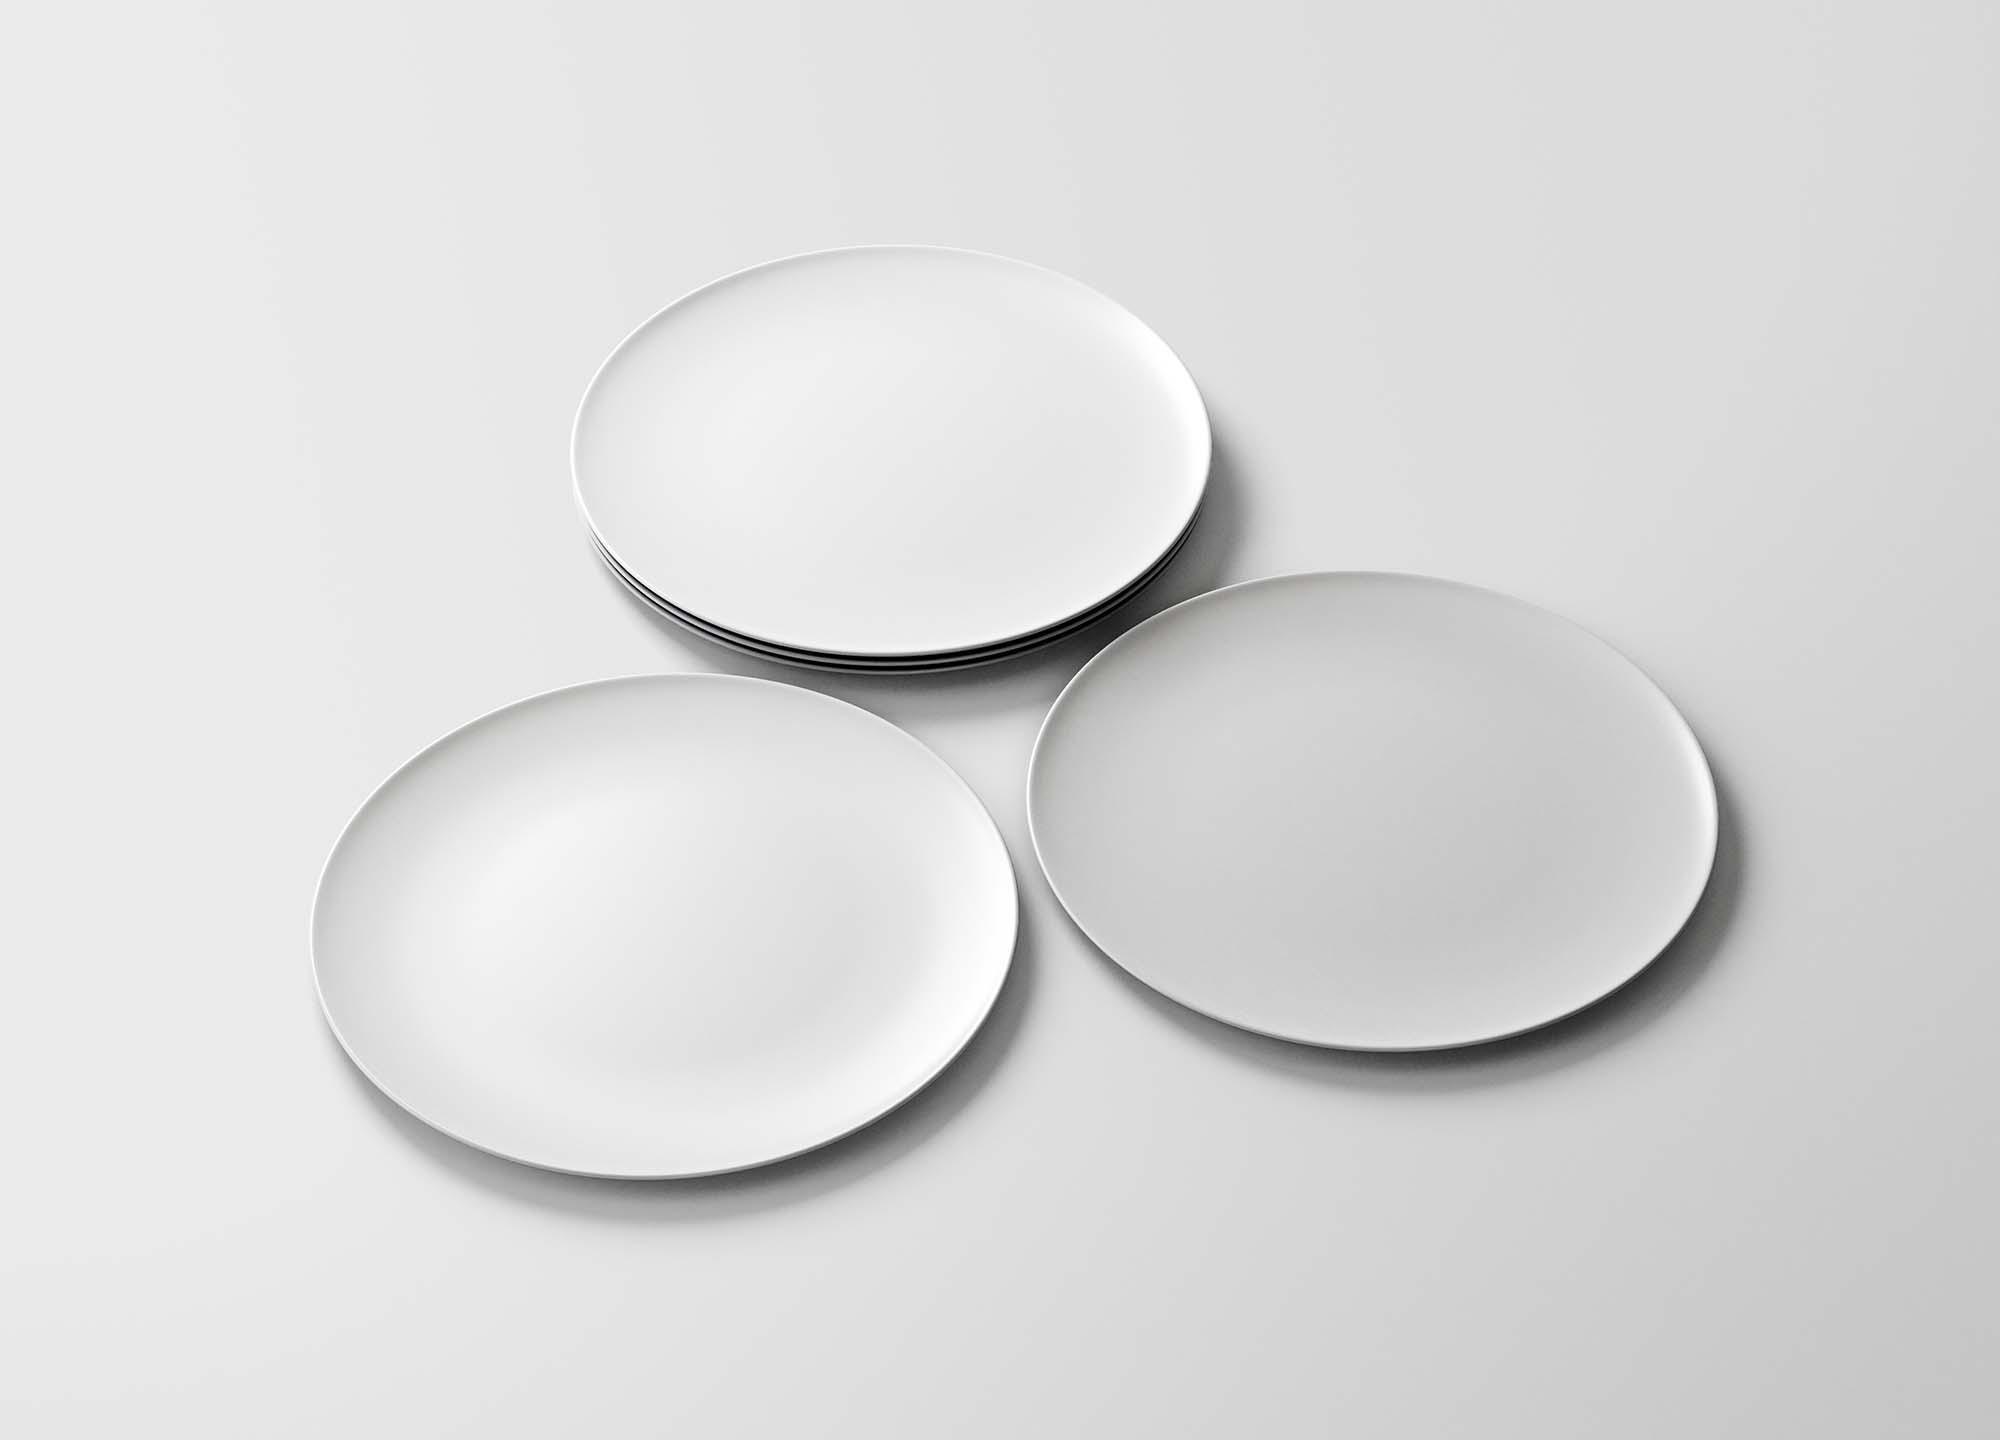 Round Dishes Mockup 2